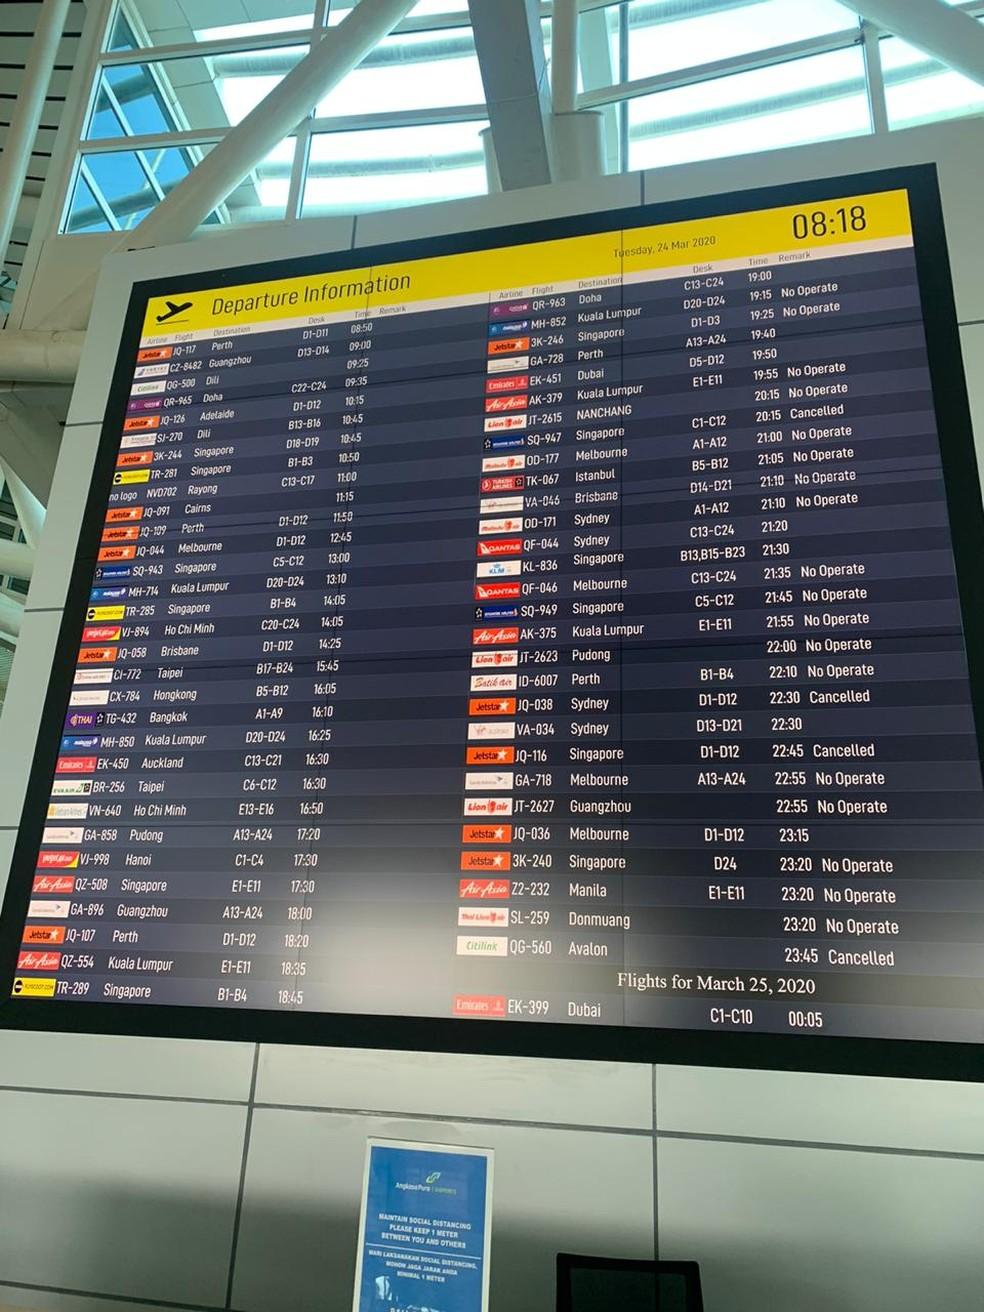 Voos cancelados em aeroporto da Indonésia durante a pandemia de coronavírus — Foto: Nicolas Puglisi